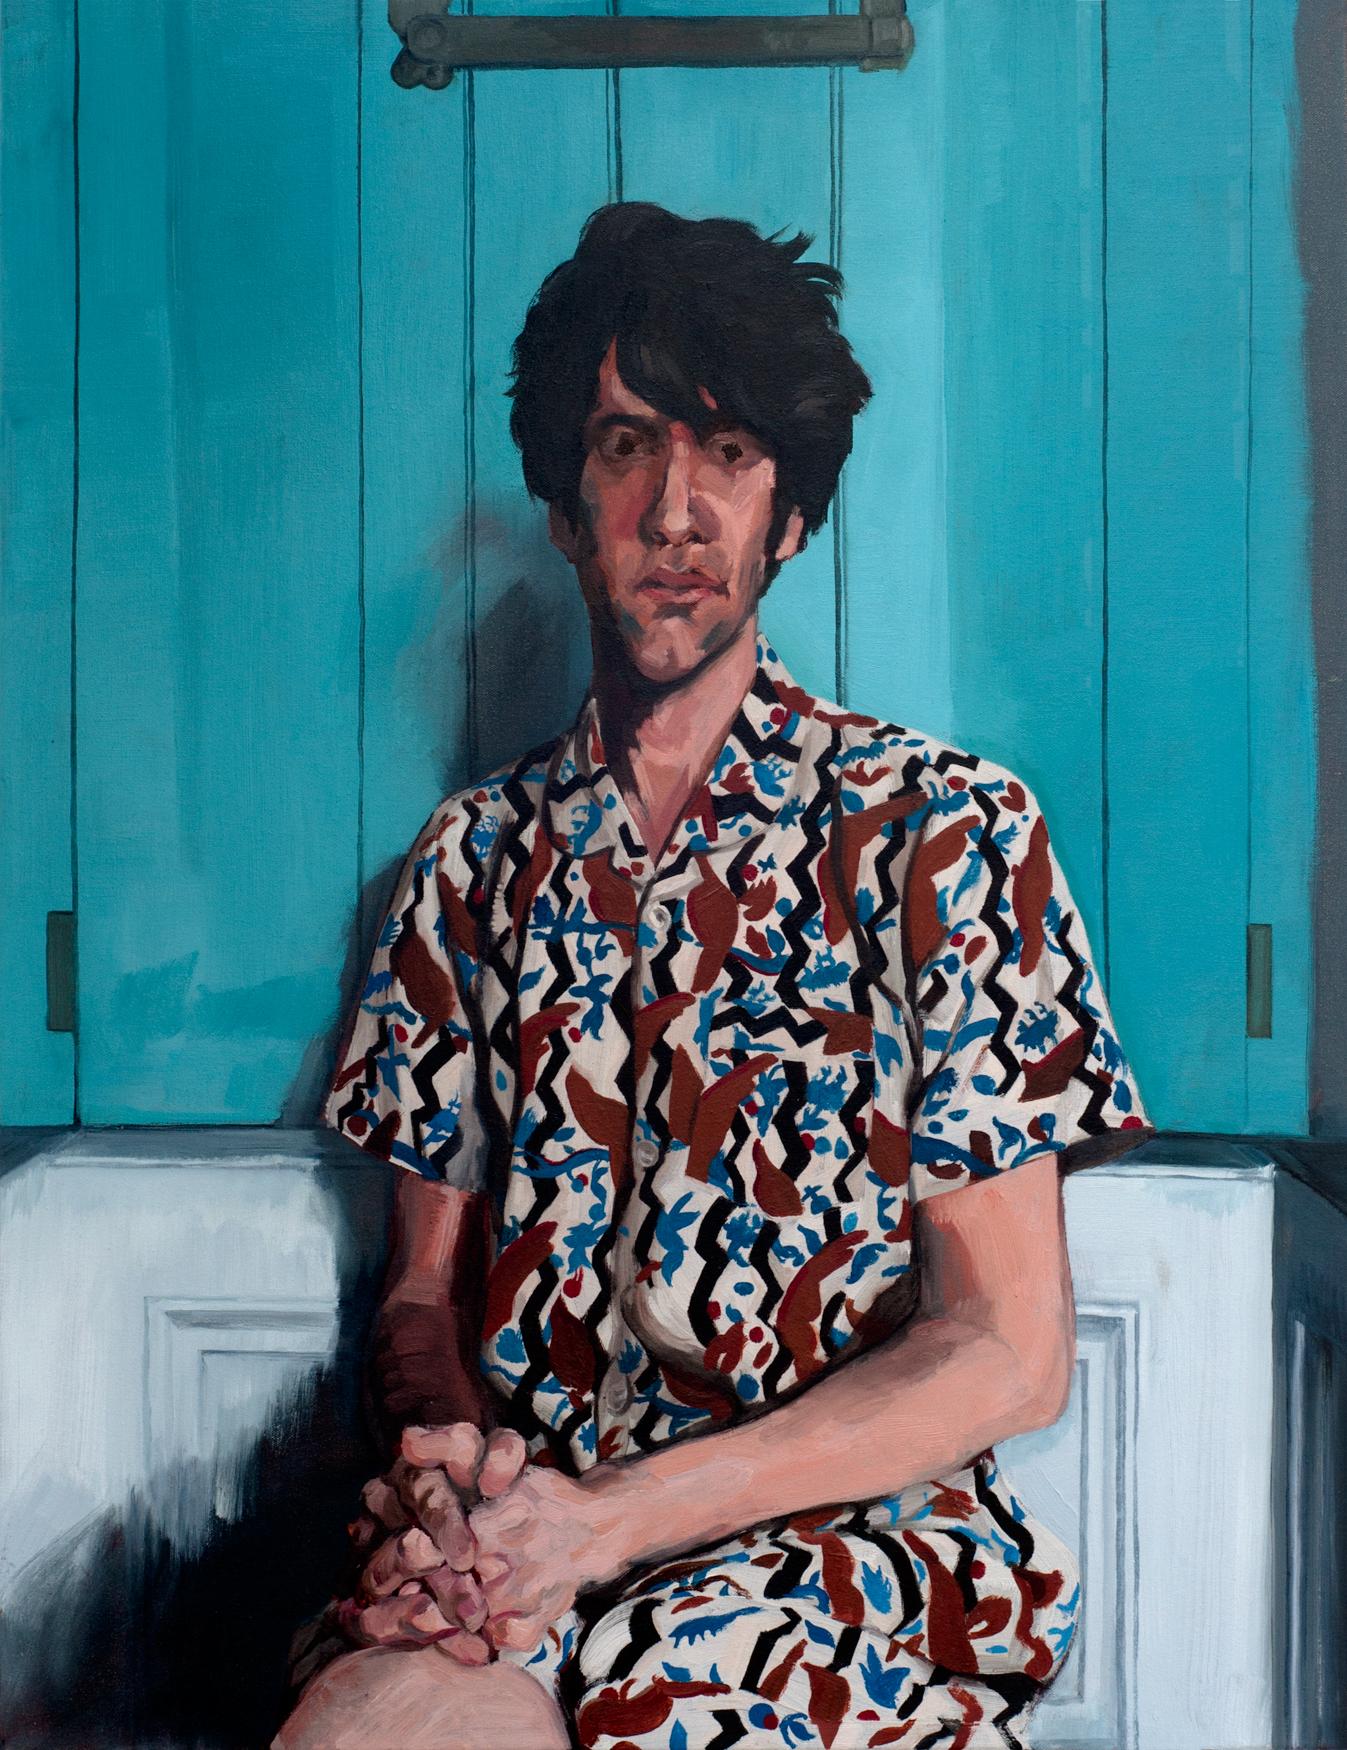 Ross McAuley, Self-portrait in pyjamas